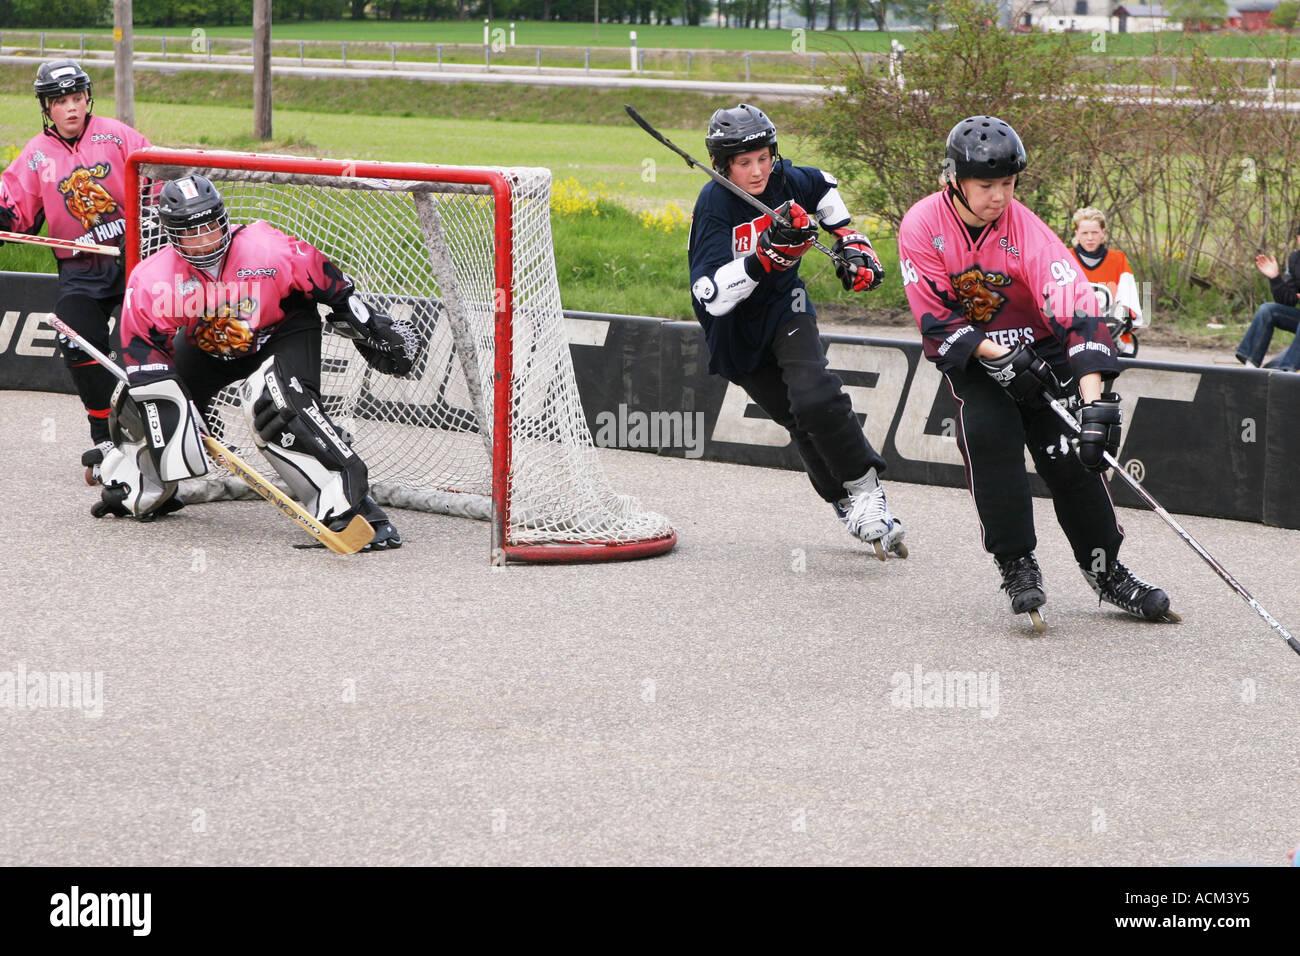 kids playing street hockey on asphalt with inlines hockey